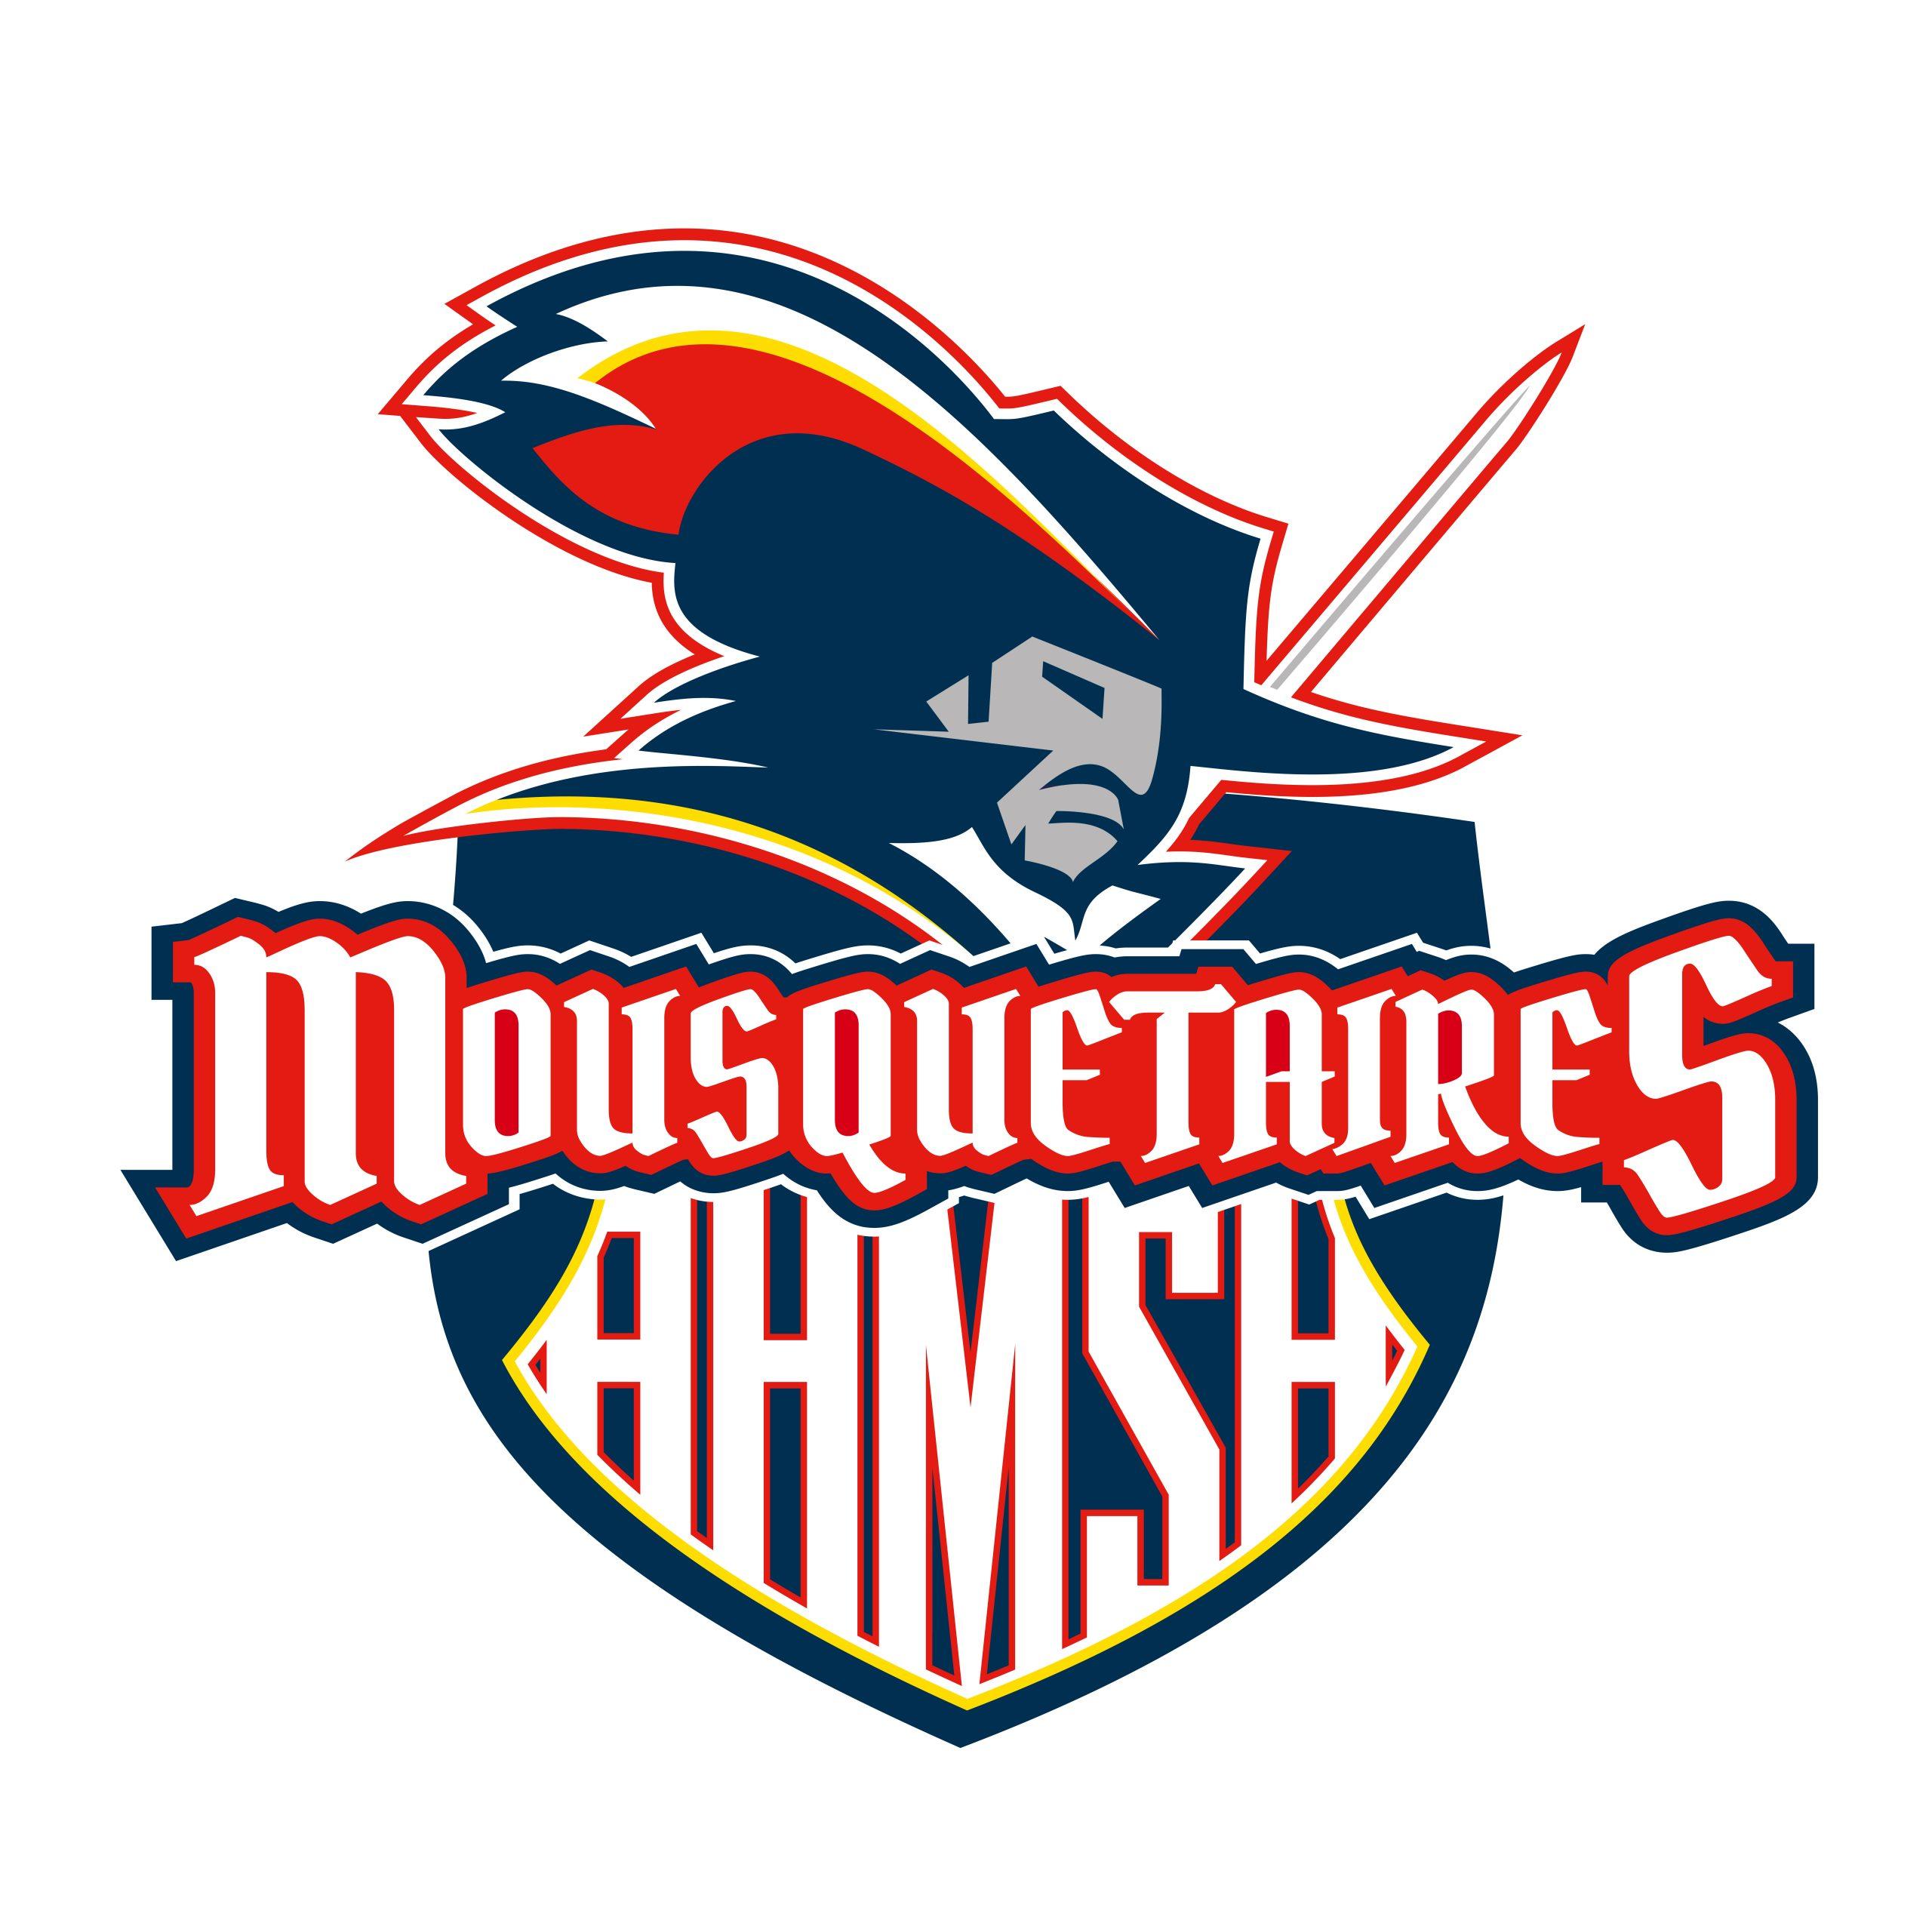 L'association de hockey mineur de Saint-Hyacinthe Logo